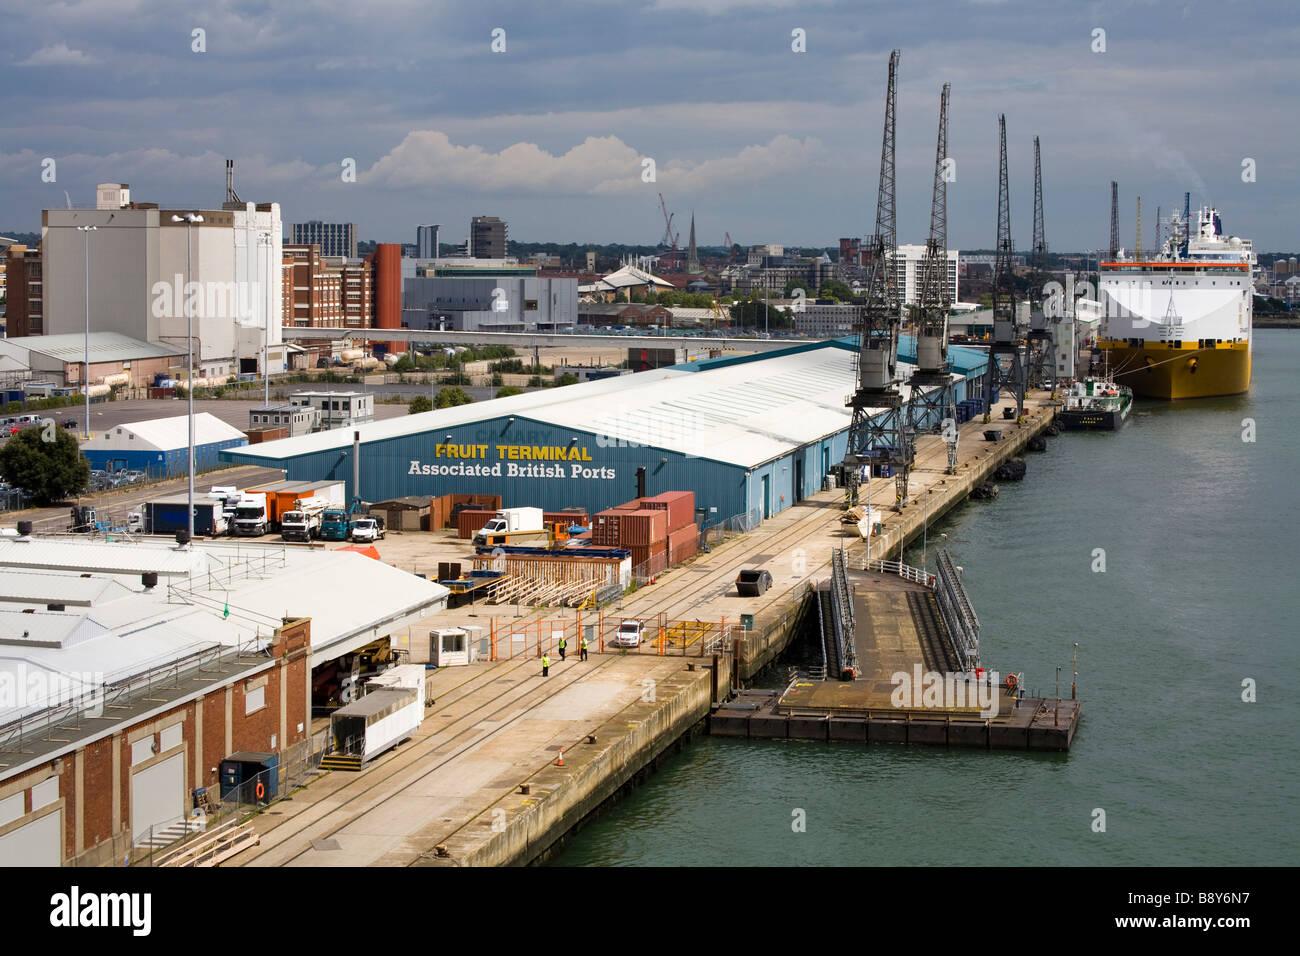 Port of Southampton, Hampshire County, England, United Kingdom - Stock Image